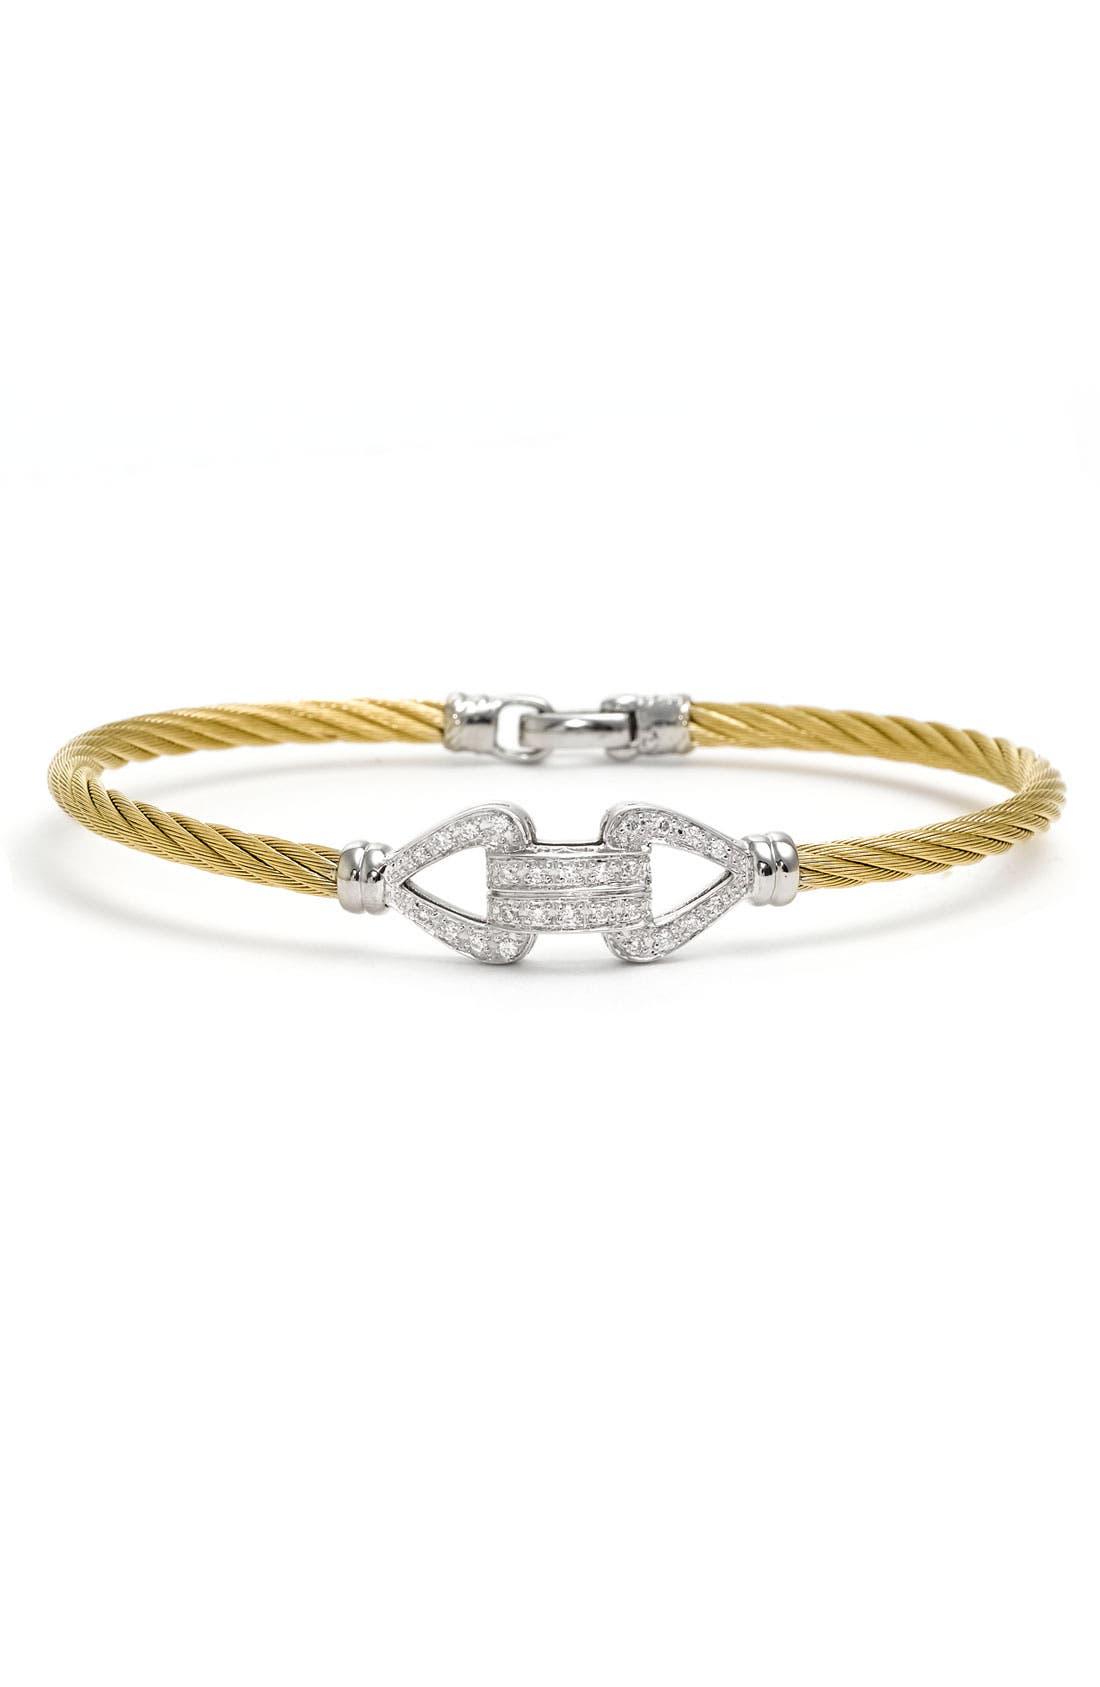 Main Image - ALOR® Double Bar Diamond Knot Bangle